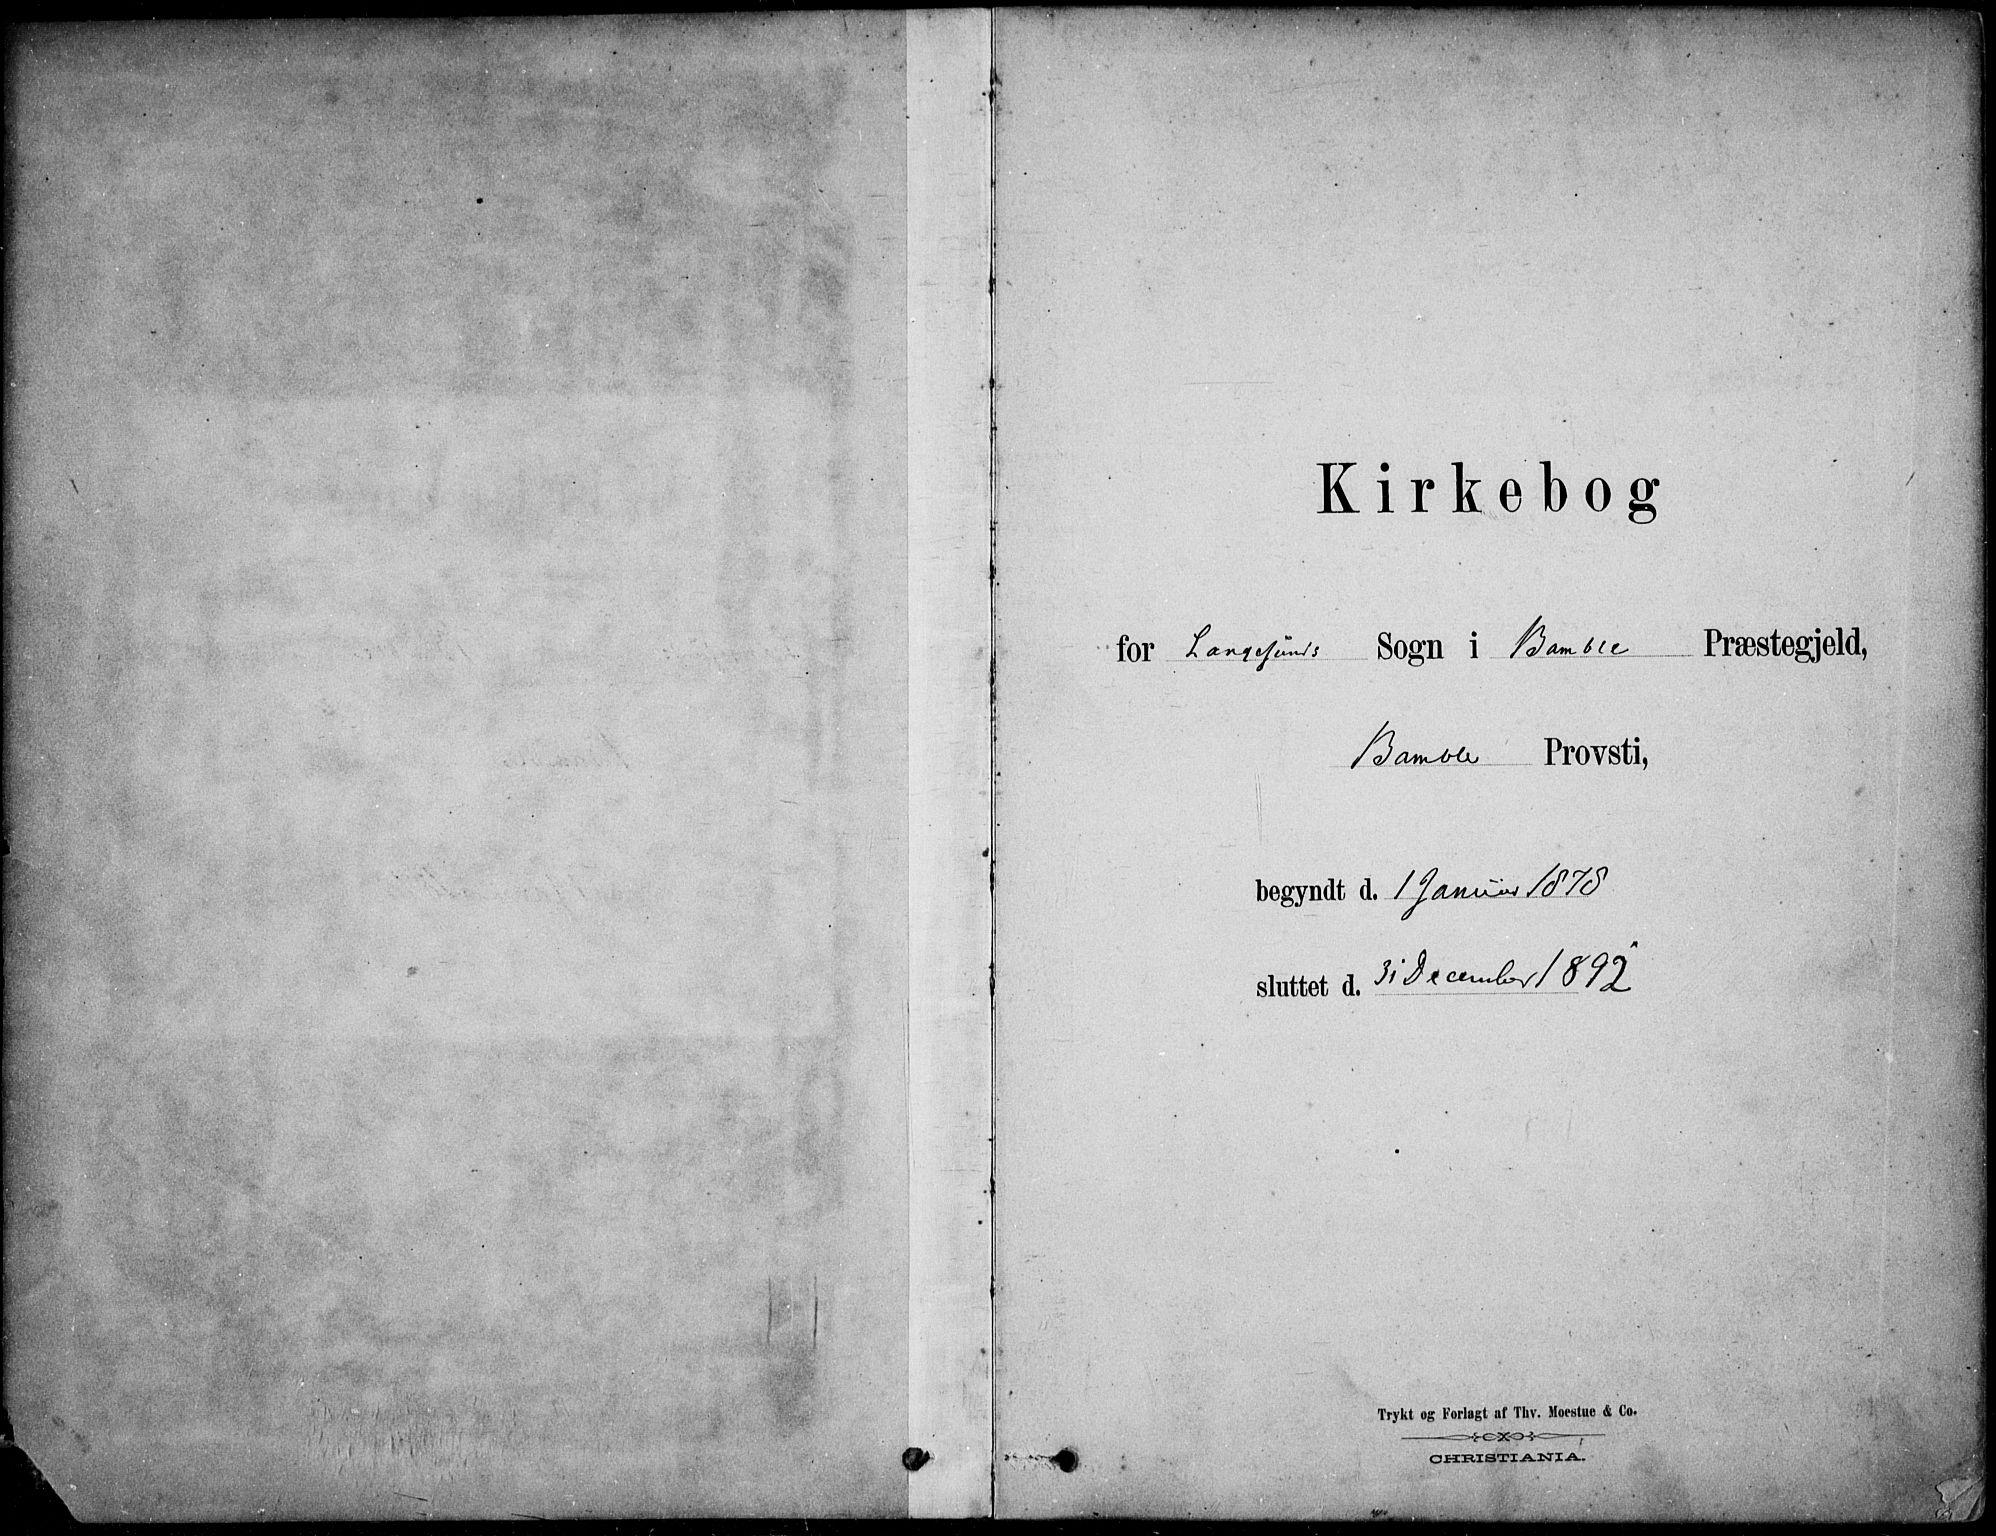 SAKO, Langesund kirkebøker, F/Fa/L0002: Ministerialbok nr. 2, 1878-1892